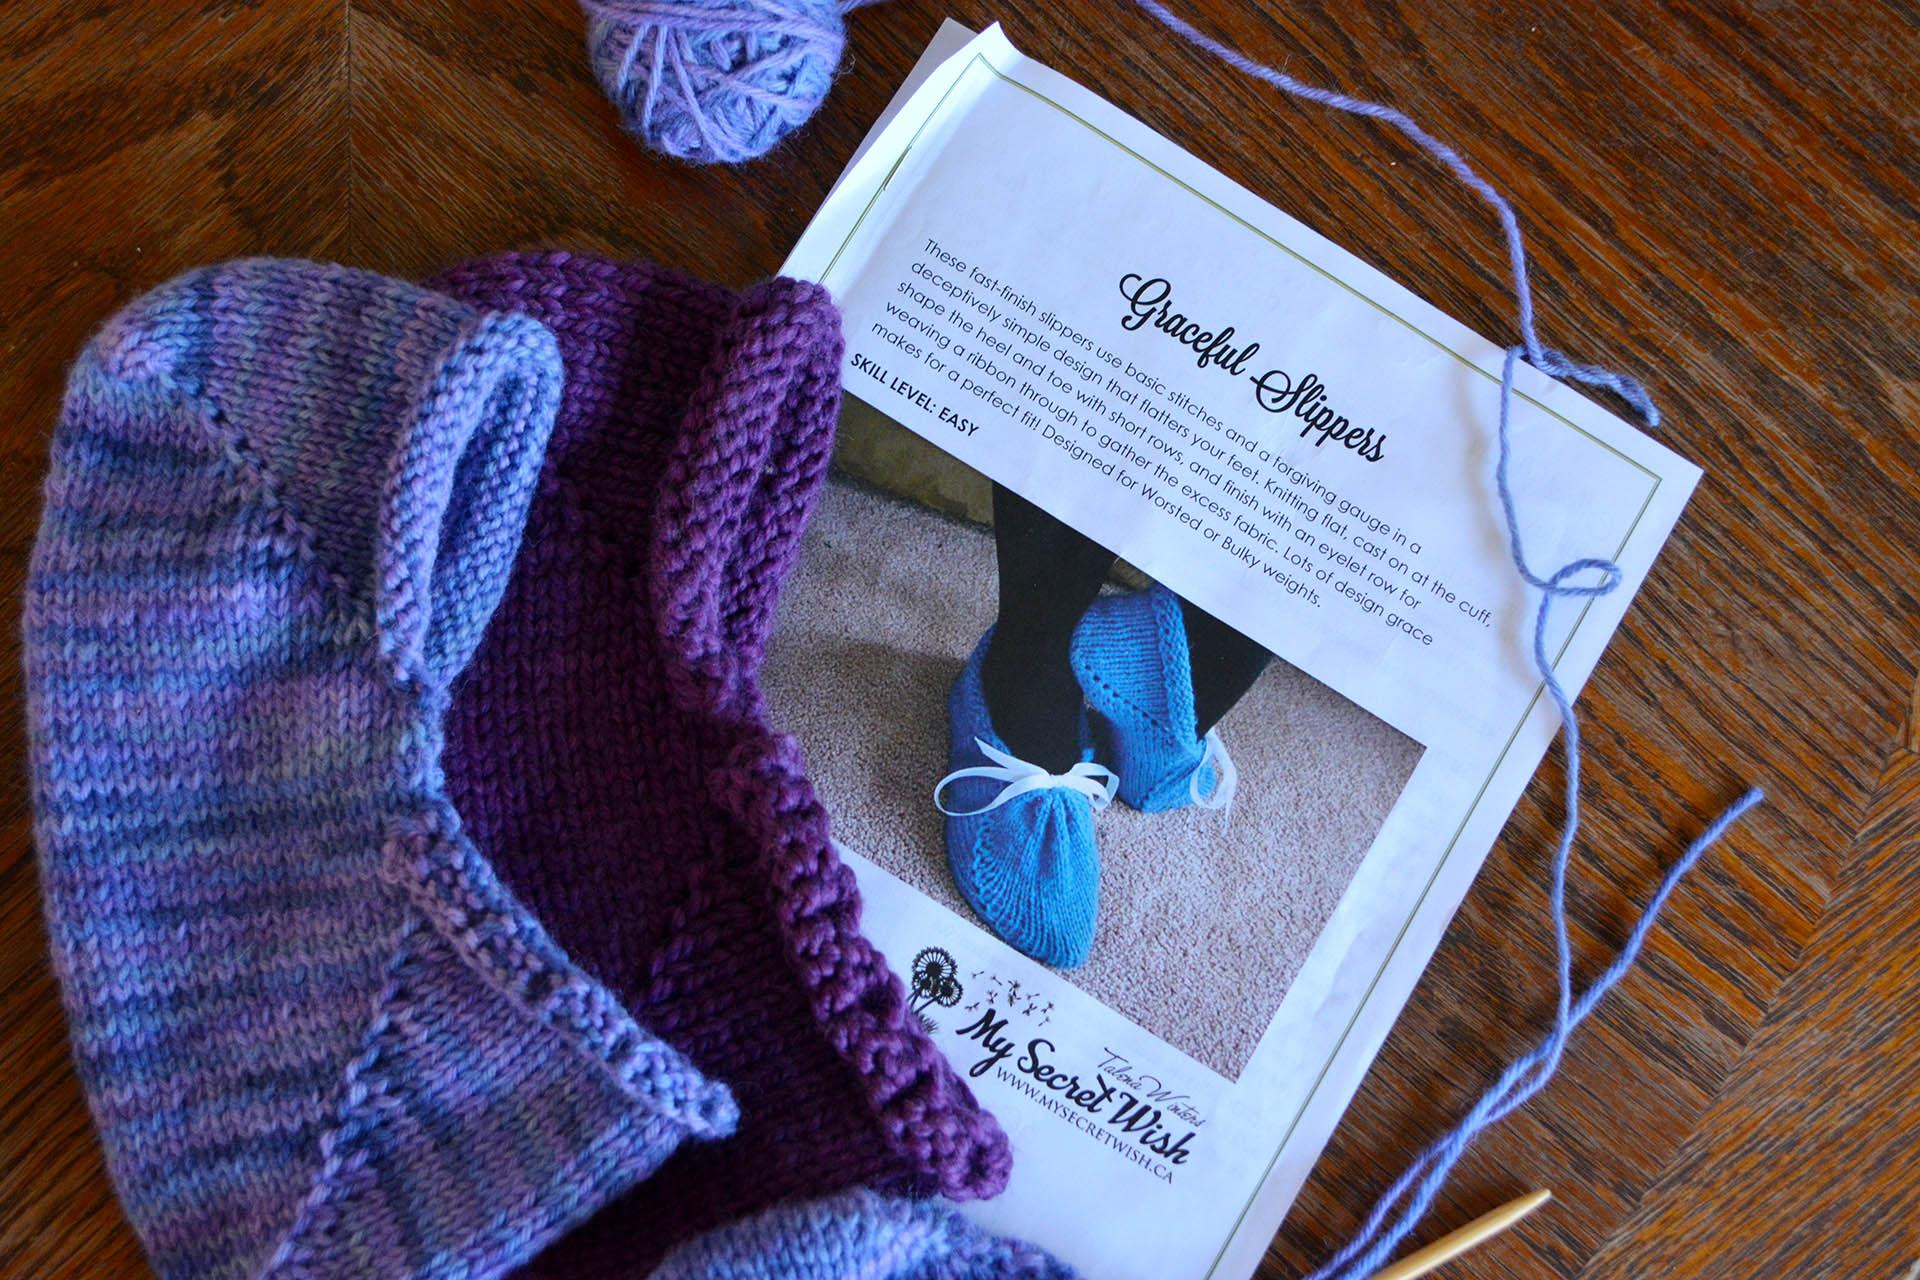 Graceful Slippers by Talena Winters